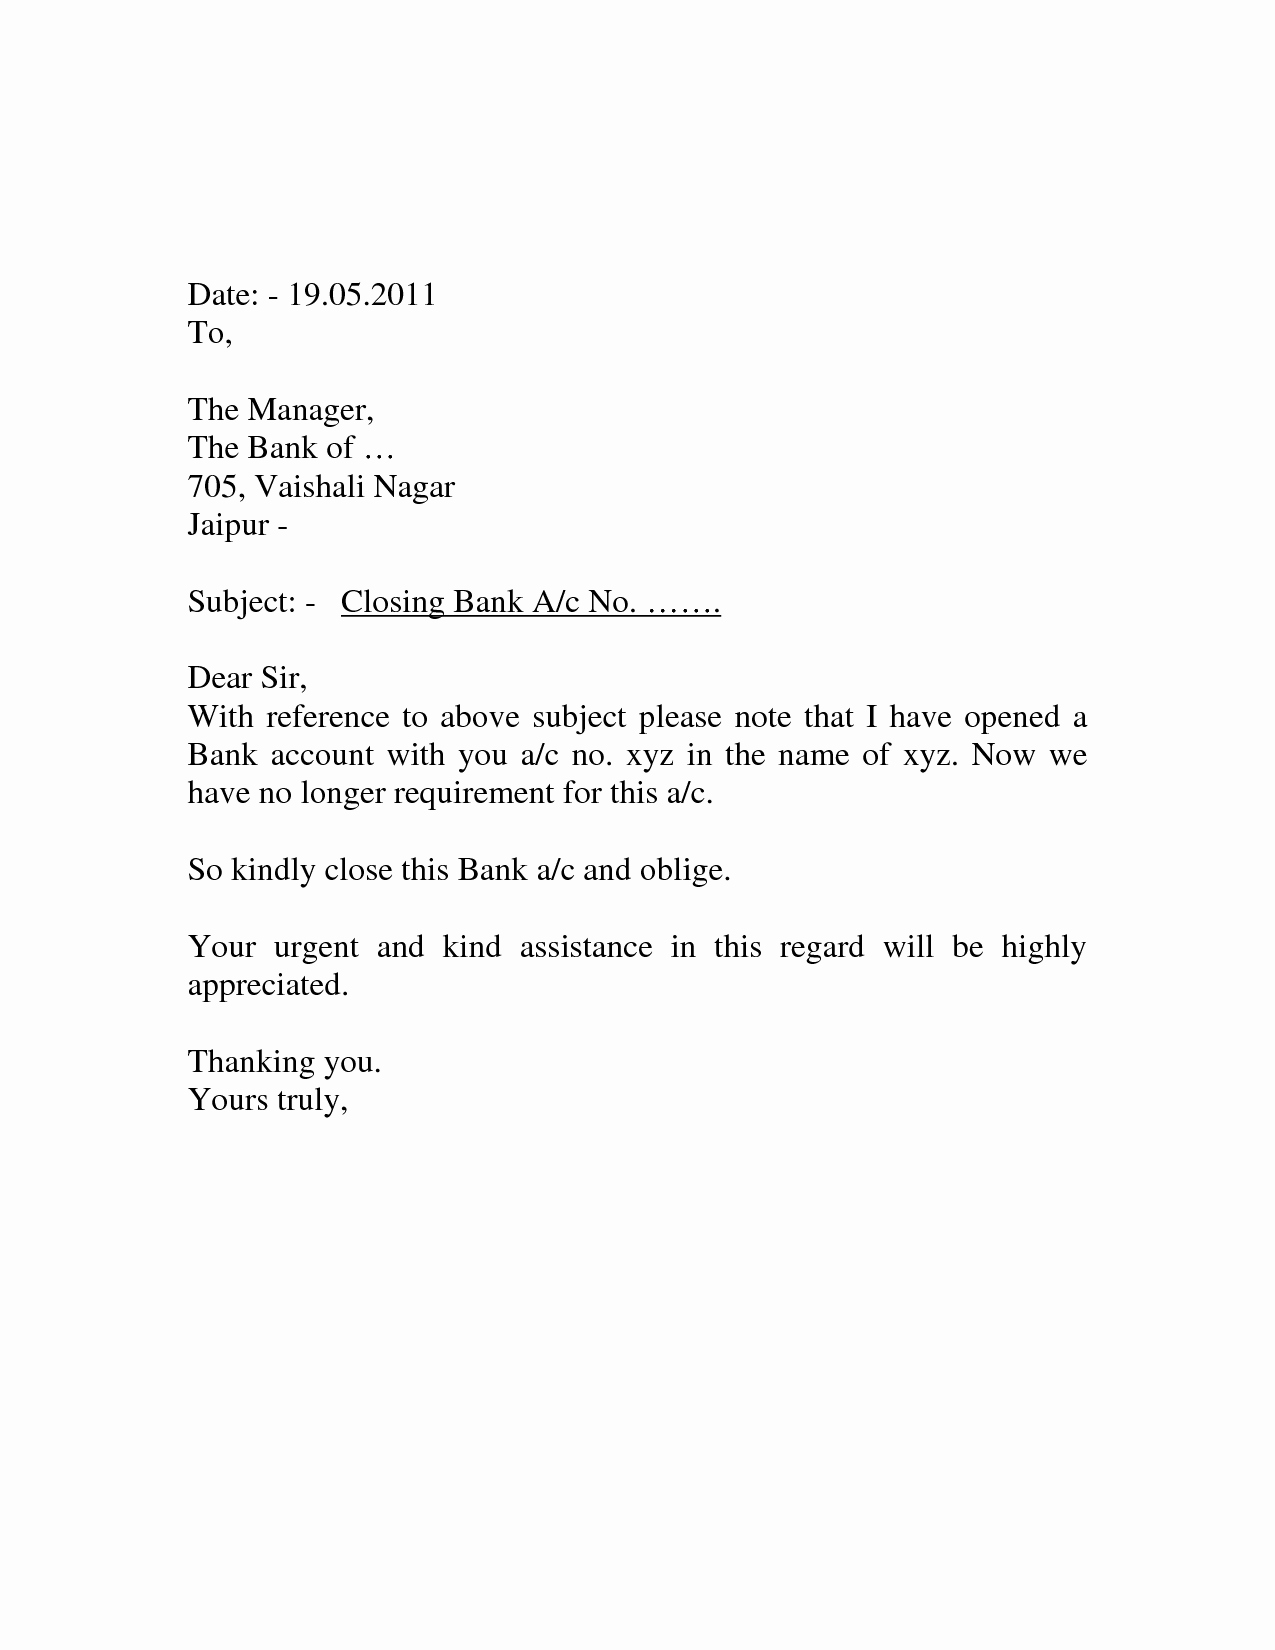 Sample Letter to Close Bank Account Elegant Sample Law School Admissions Essays Erratic Impact